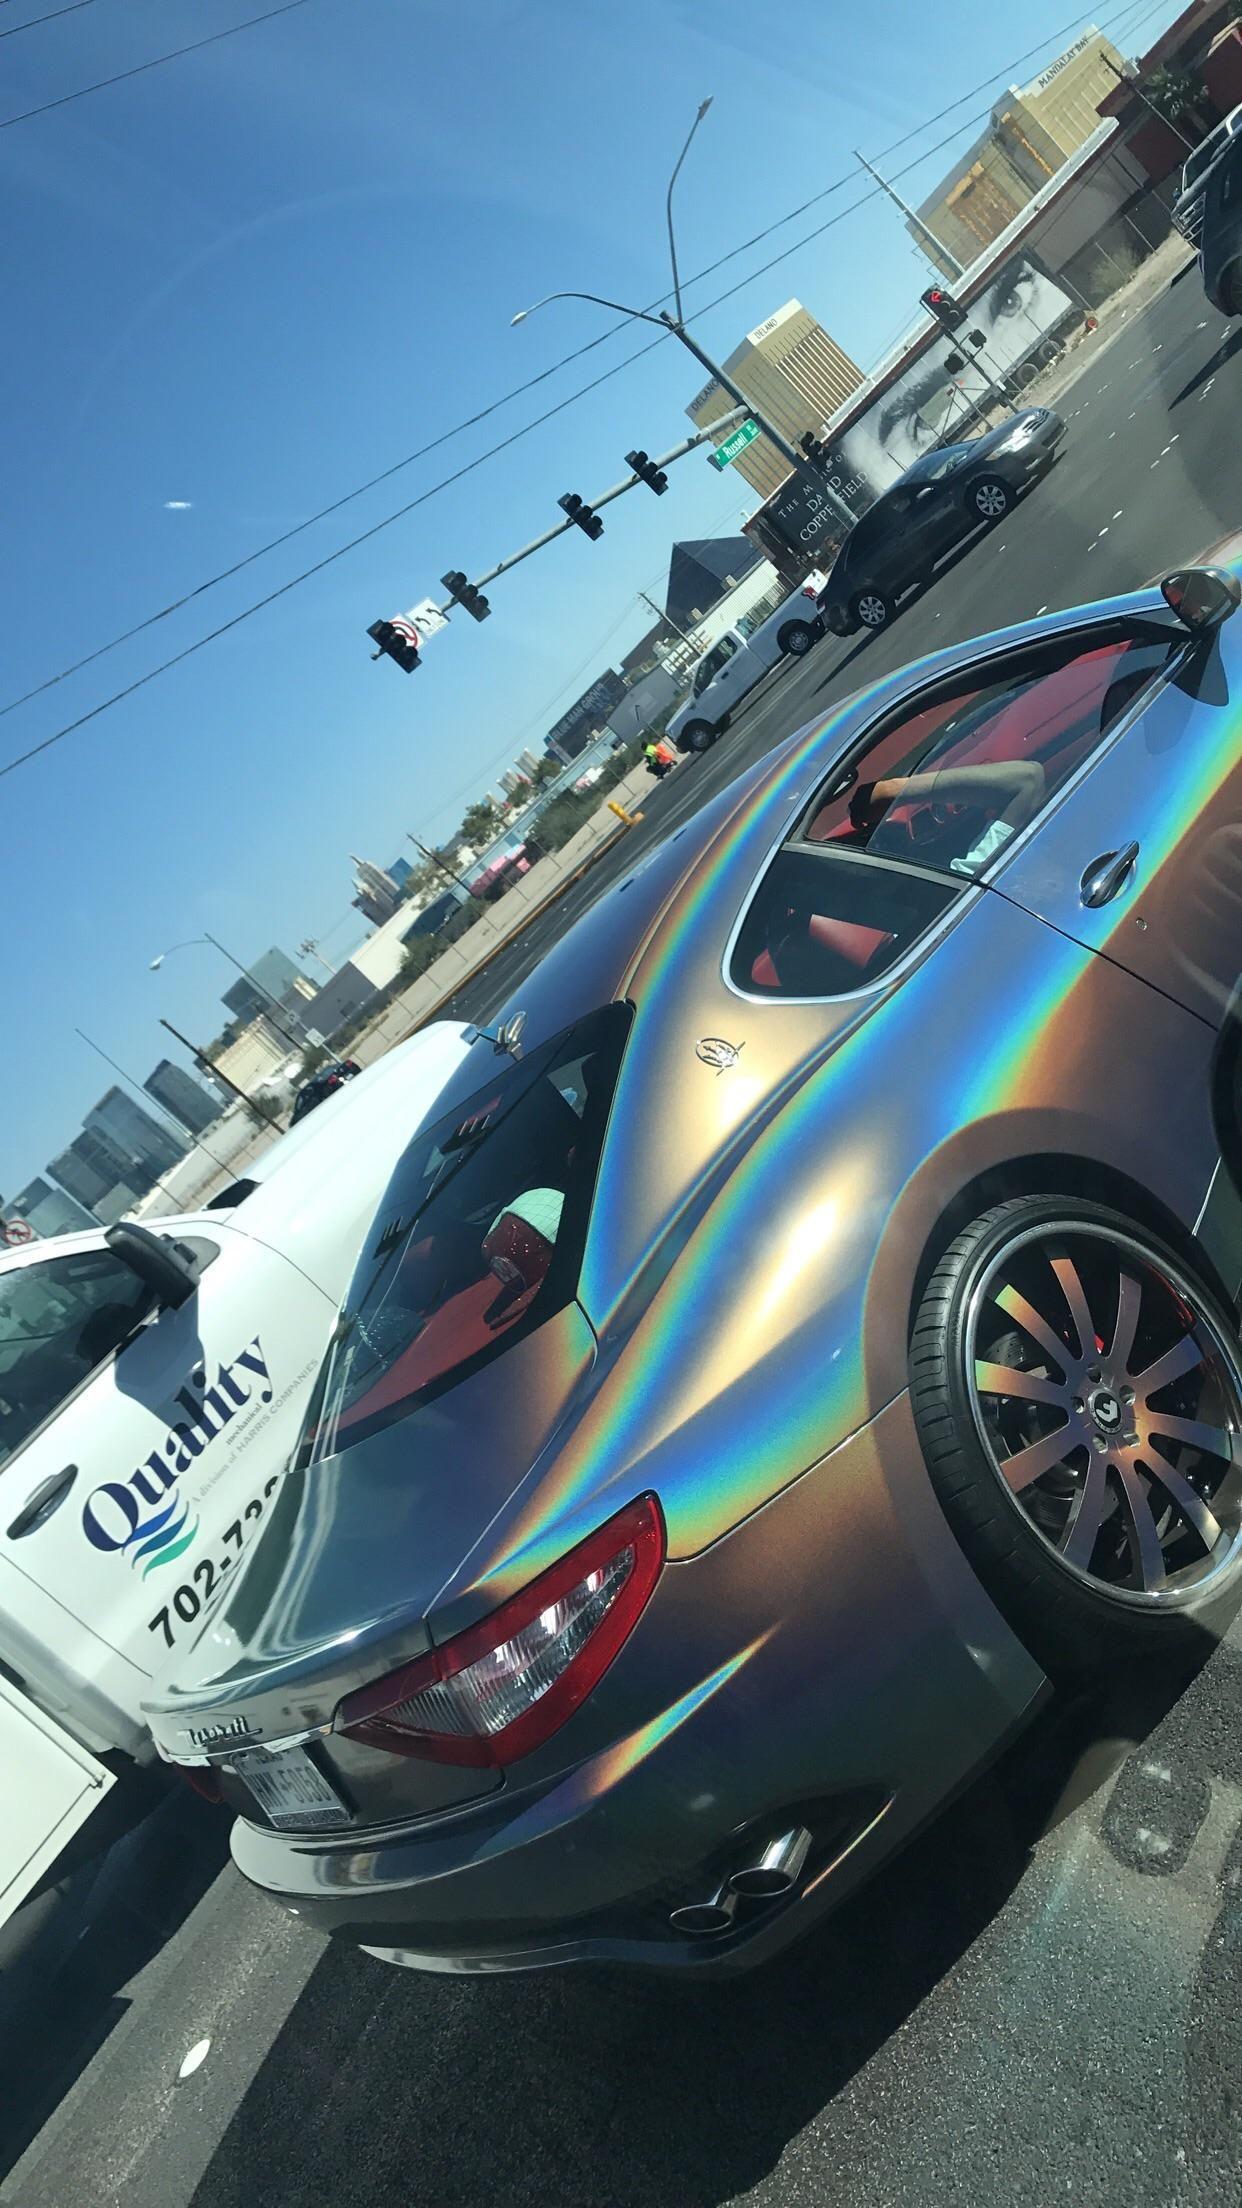 The oil slick paint job on this Maserati ATBGE Pinterest